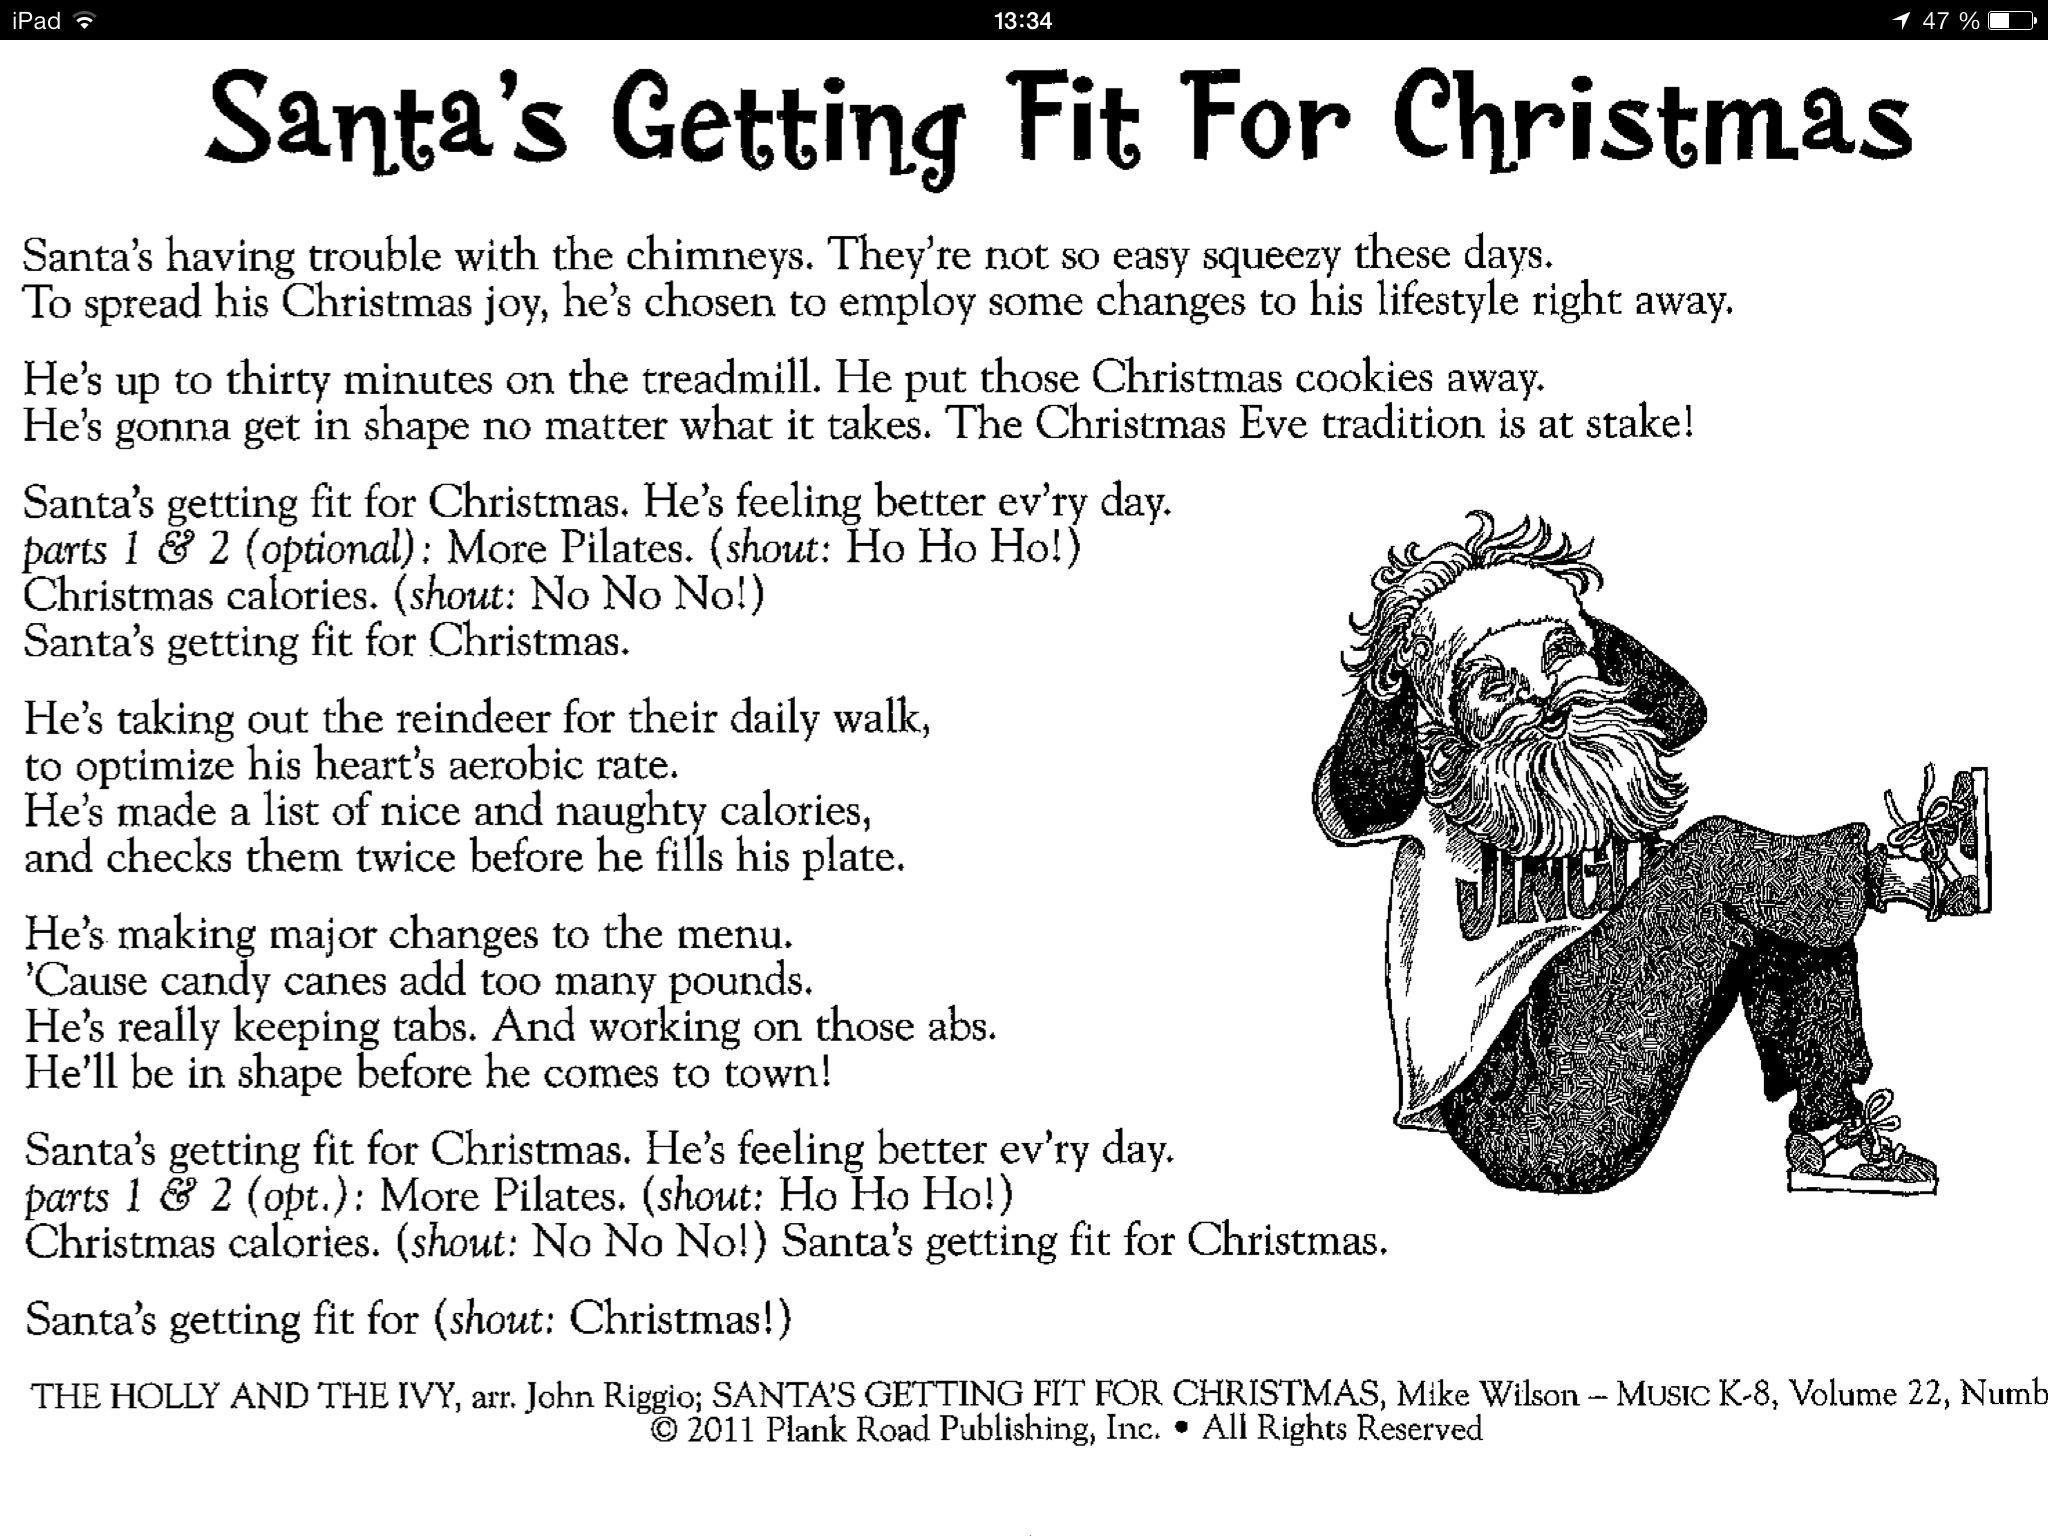 Santa's getting fit for Christmas lyrics | Christmas lyrics, Christmas songs for kids ...